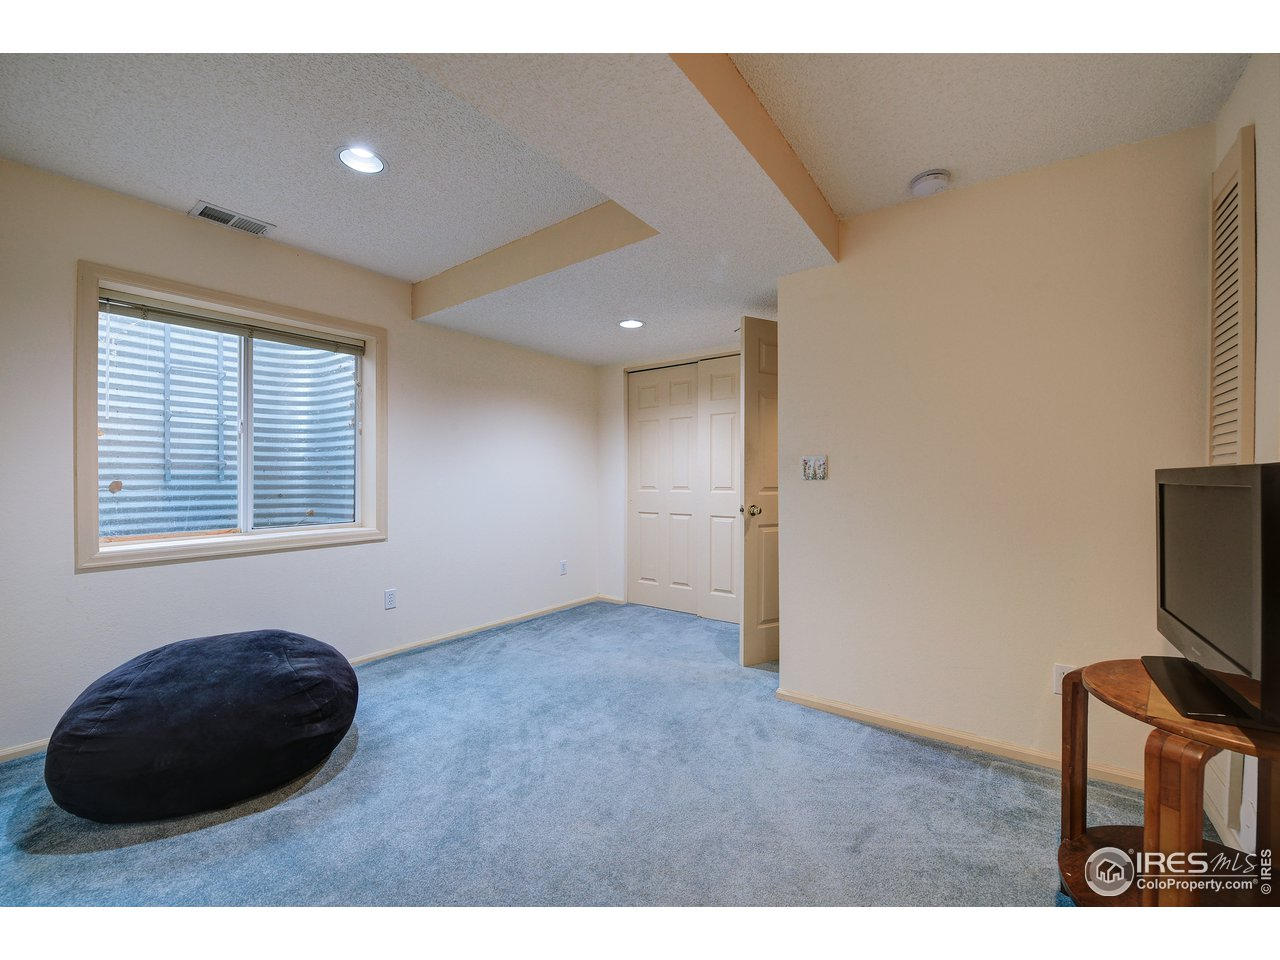 Basement Bedroom or Rec Room